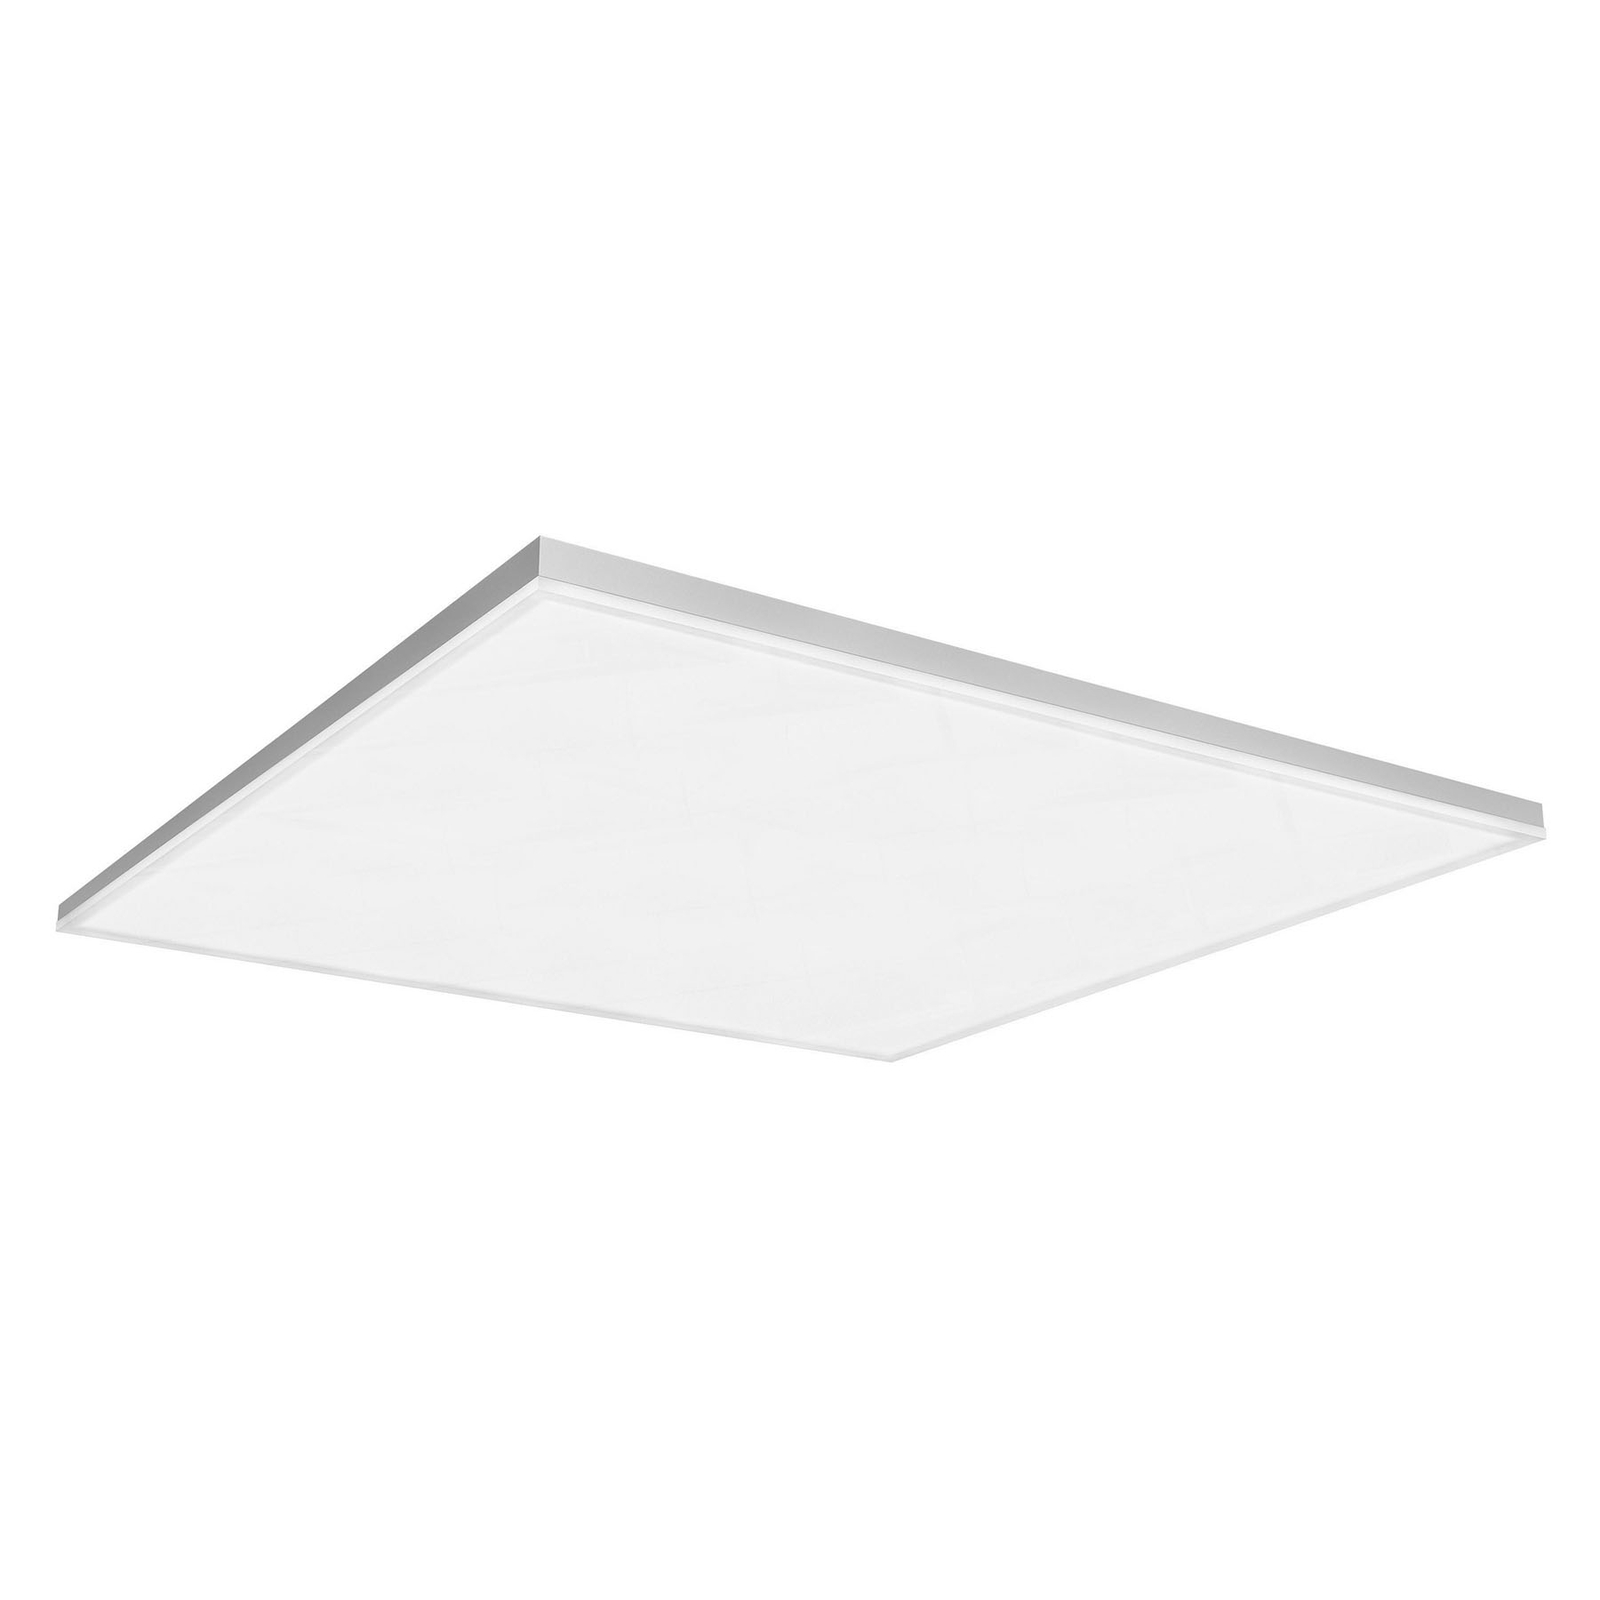 Ledvance Planon Frameless Square LED-Panel 60x60cm